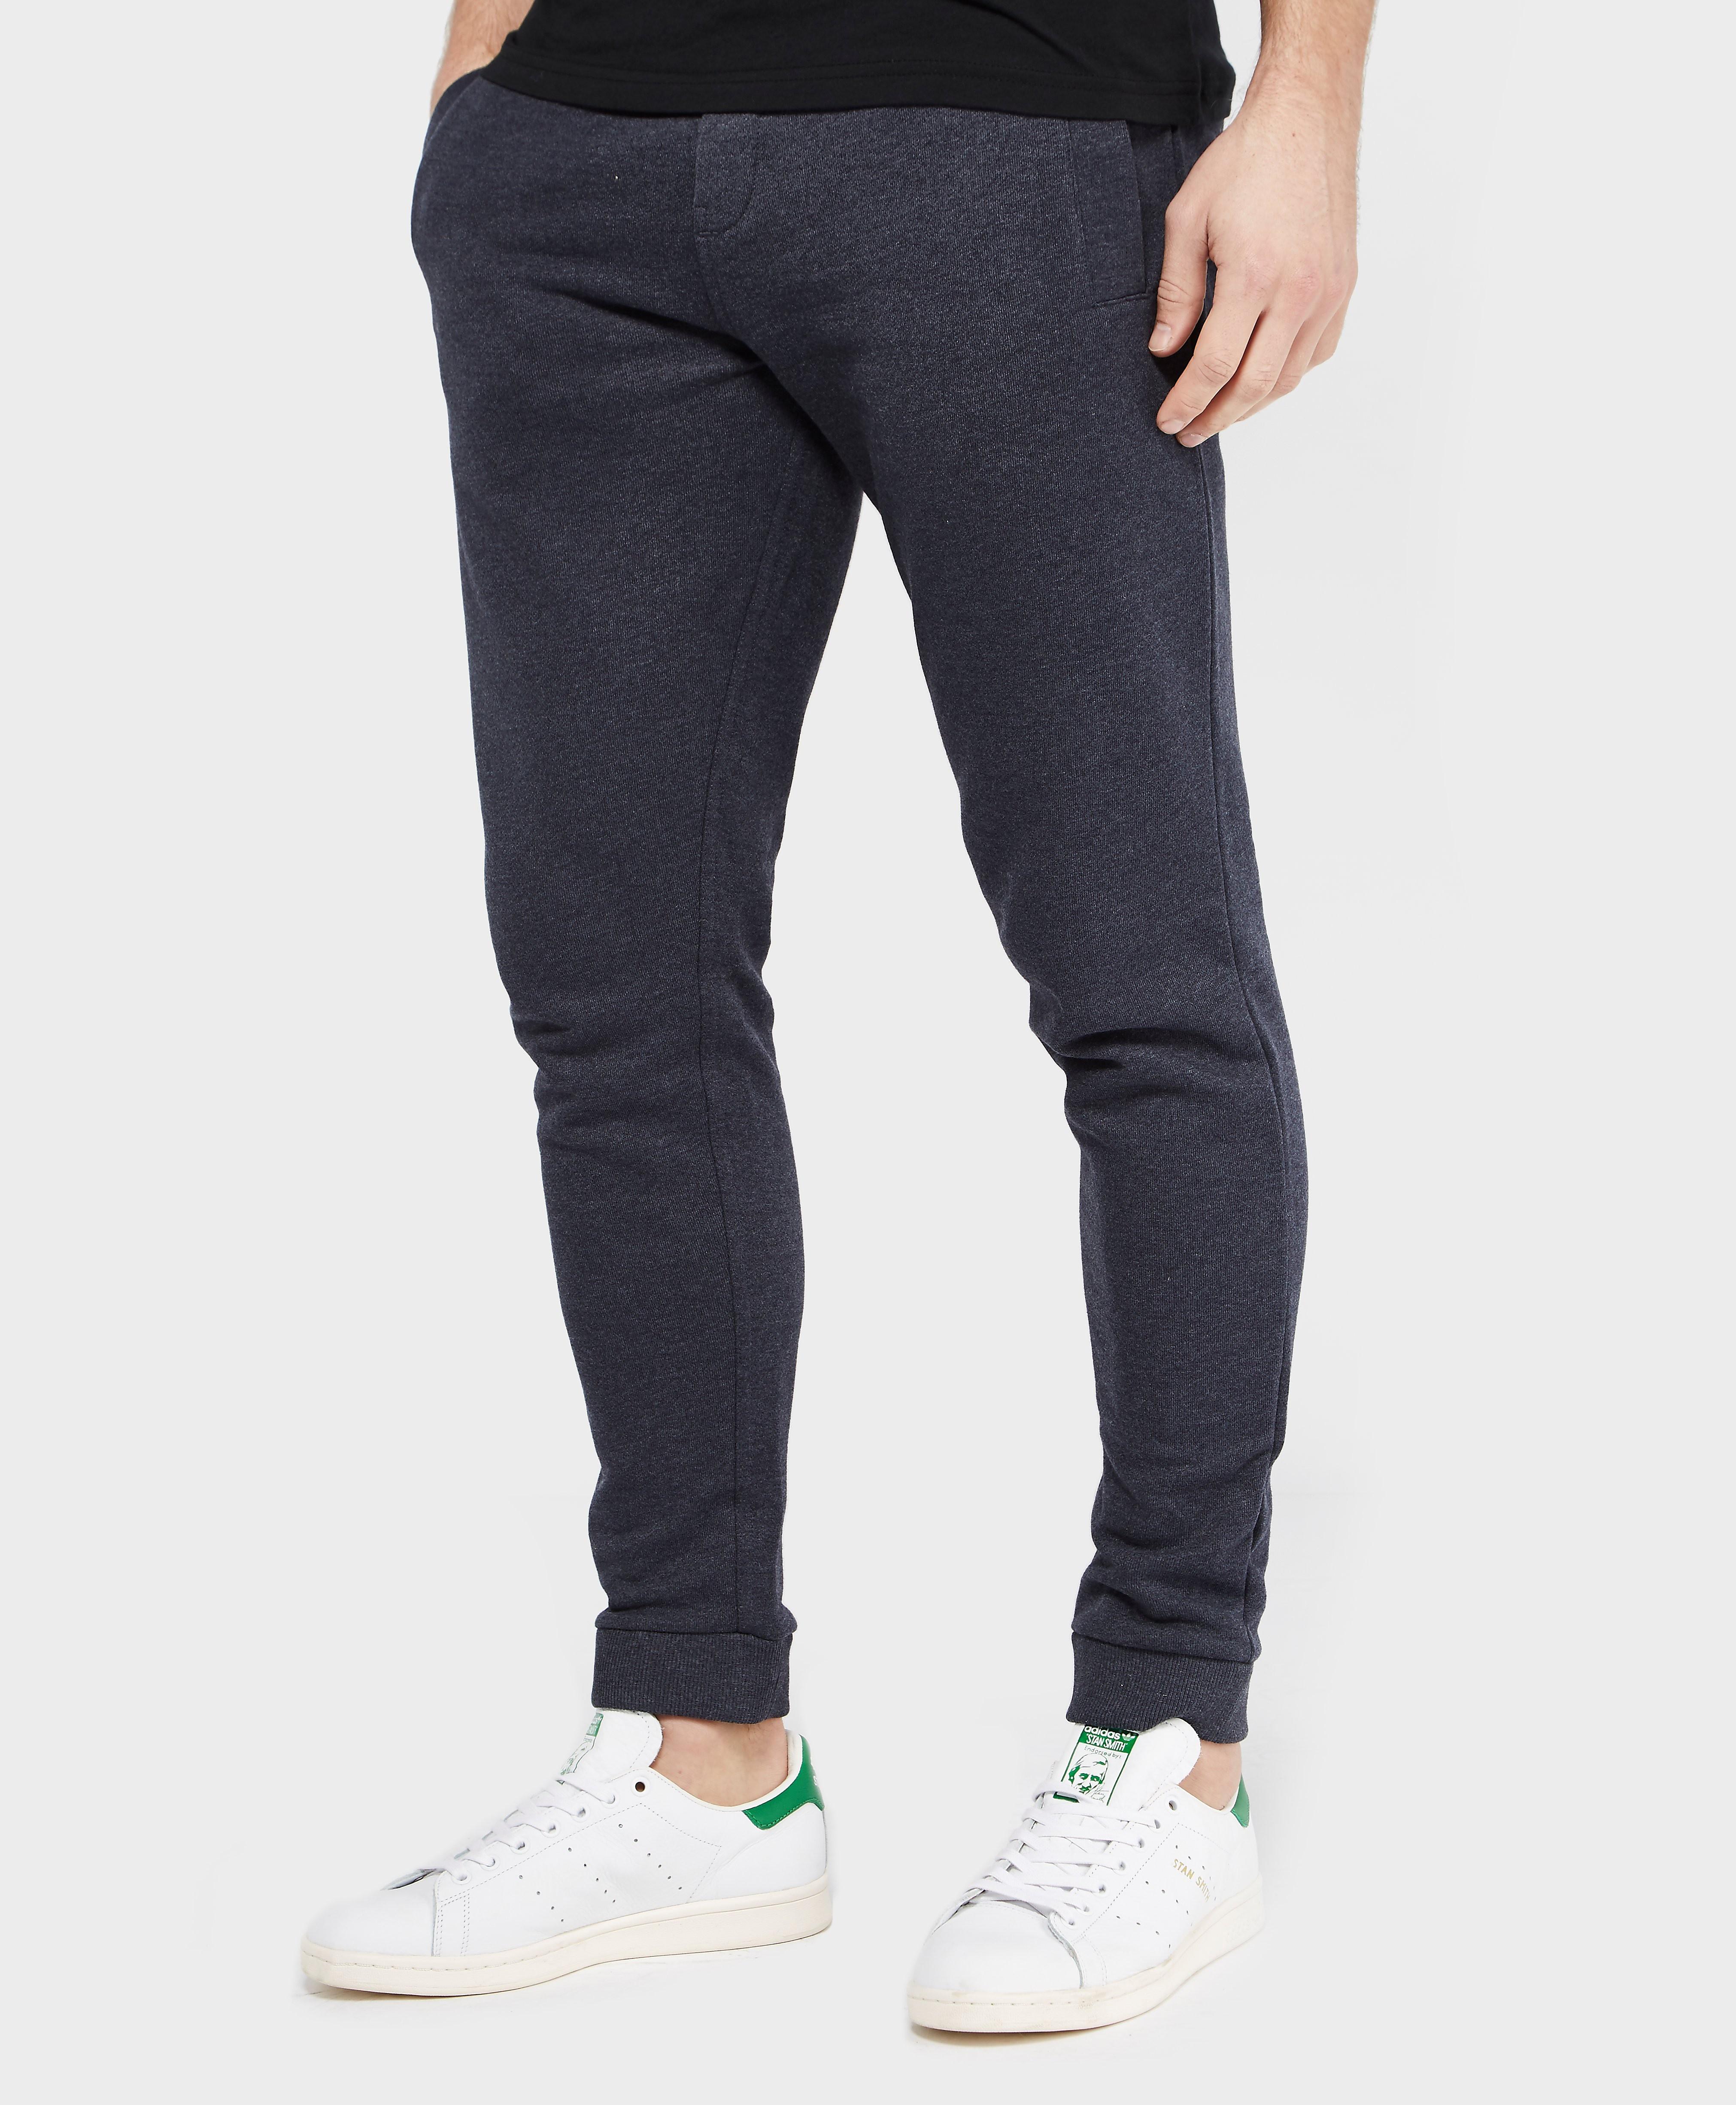 Tommy Hilfiger Cuff Track Pants